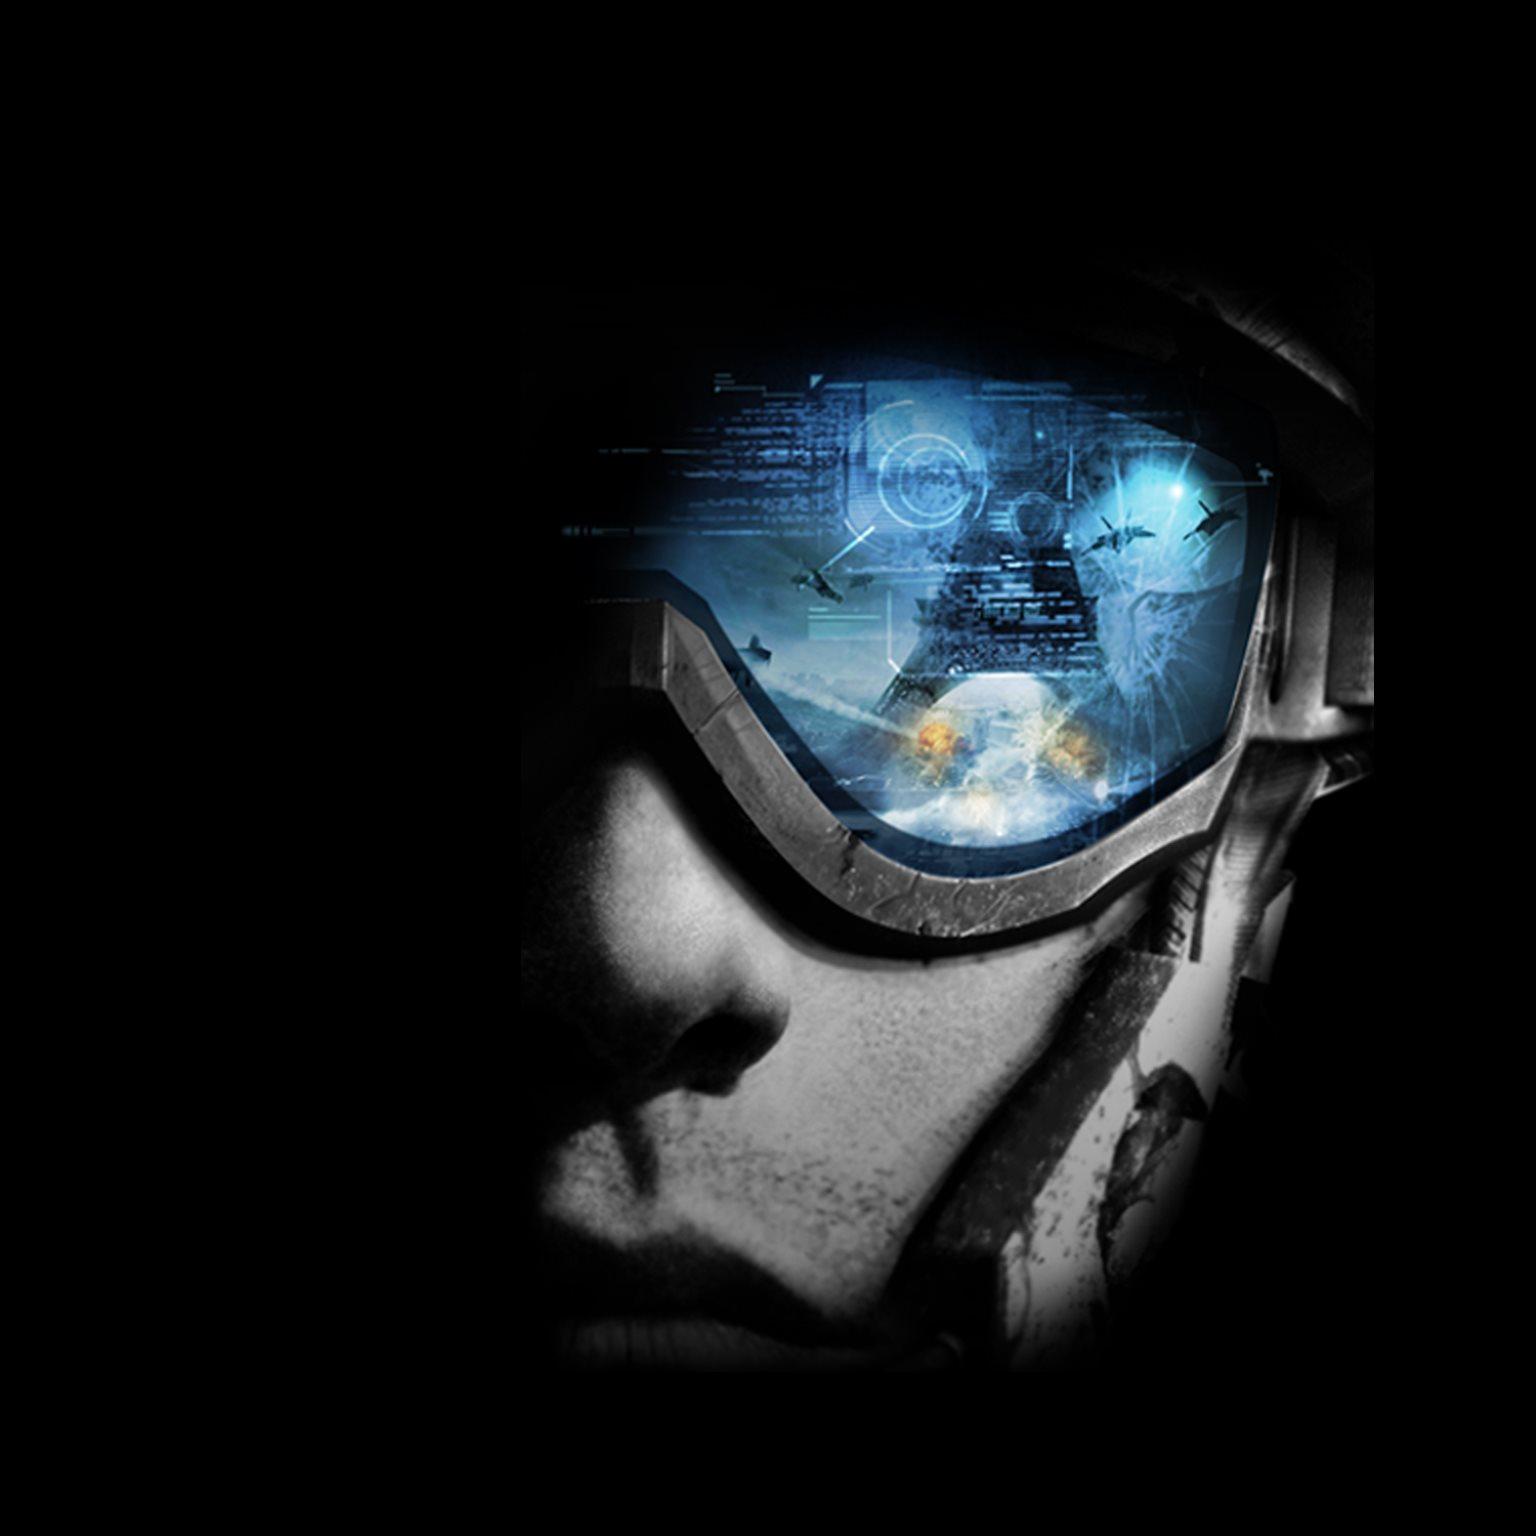 Hd wallpaper 3 tom clancy s endwar online - The 3rd Hd Wallpaper From Tom Clancy S Endwar Online